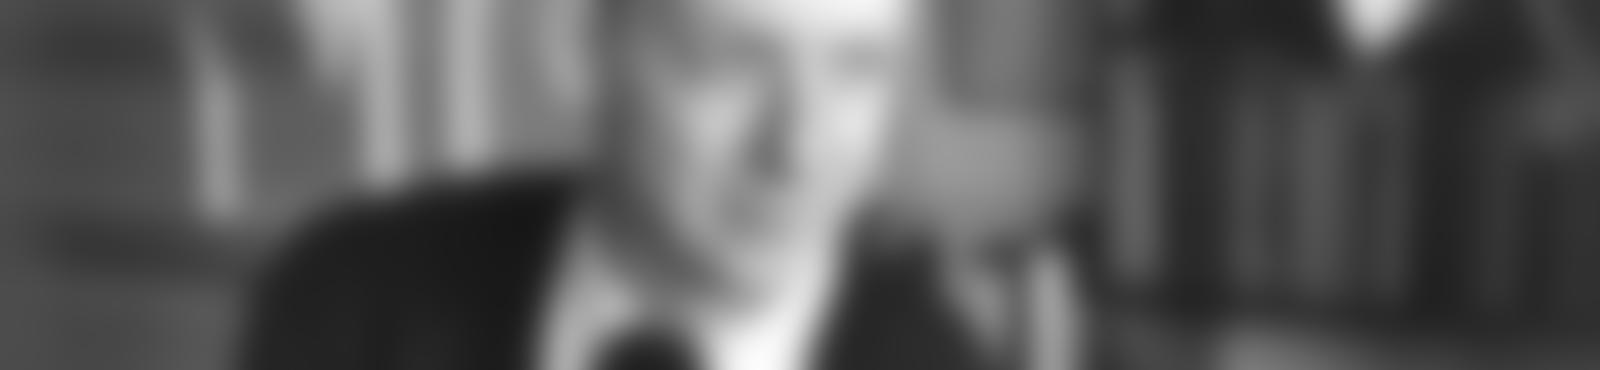 Blurred f1894dce 147c 4190 a07a 240f88eba890